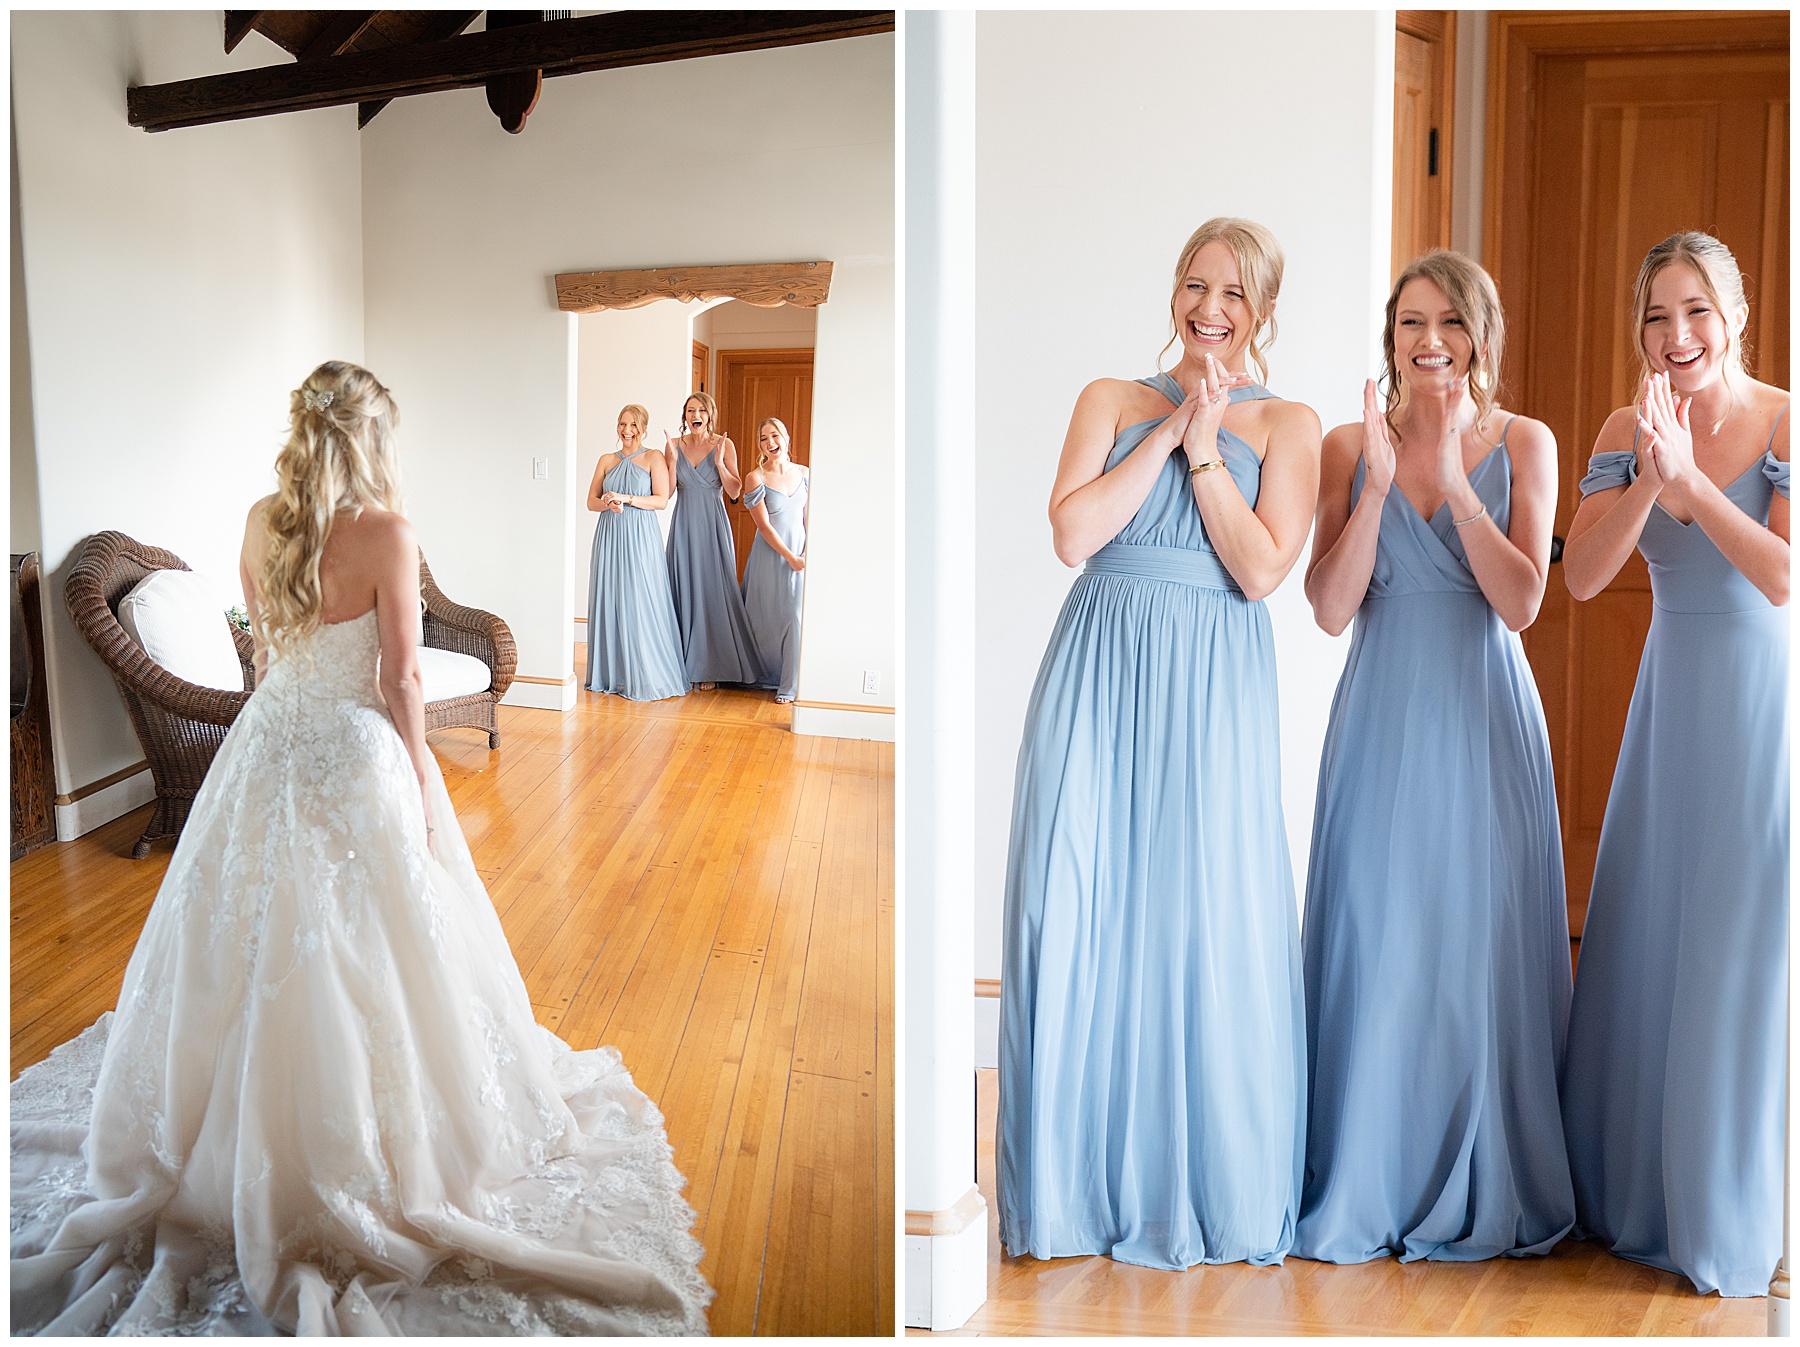 first look between bride and bridesmaids